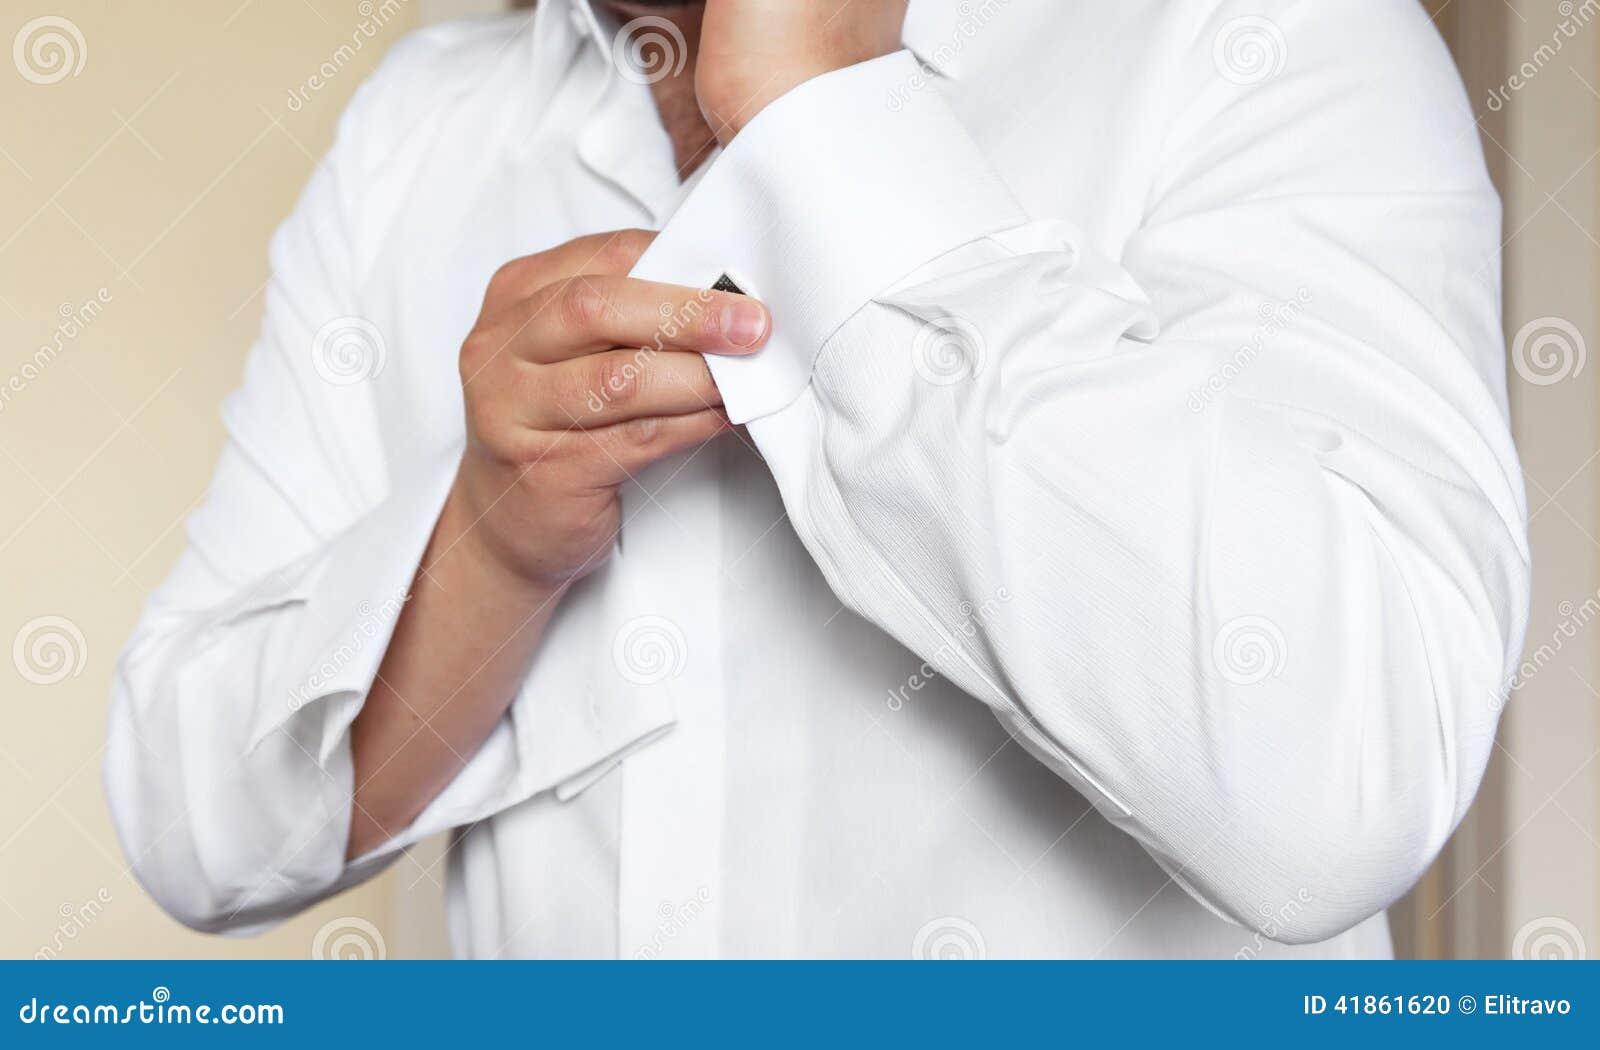 23a10cf0d3b2 Το άτομο βάζει τα μανικετόκουμπα στα άσπρα πουκάμισα μανικιών Στοκ ...